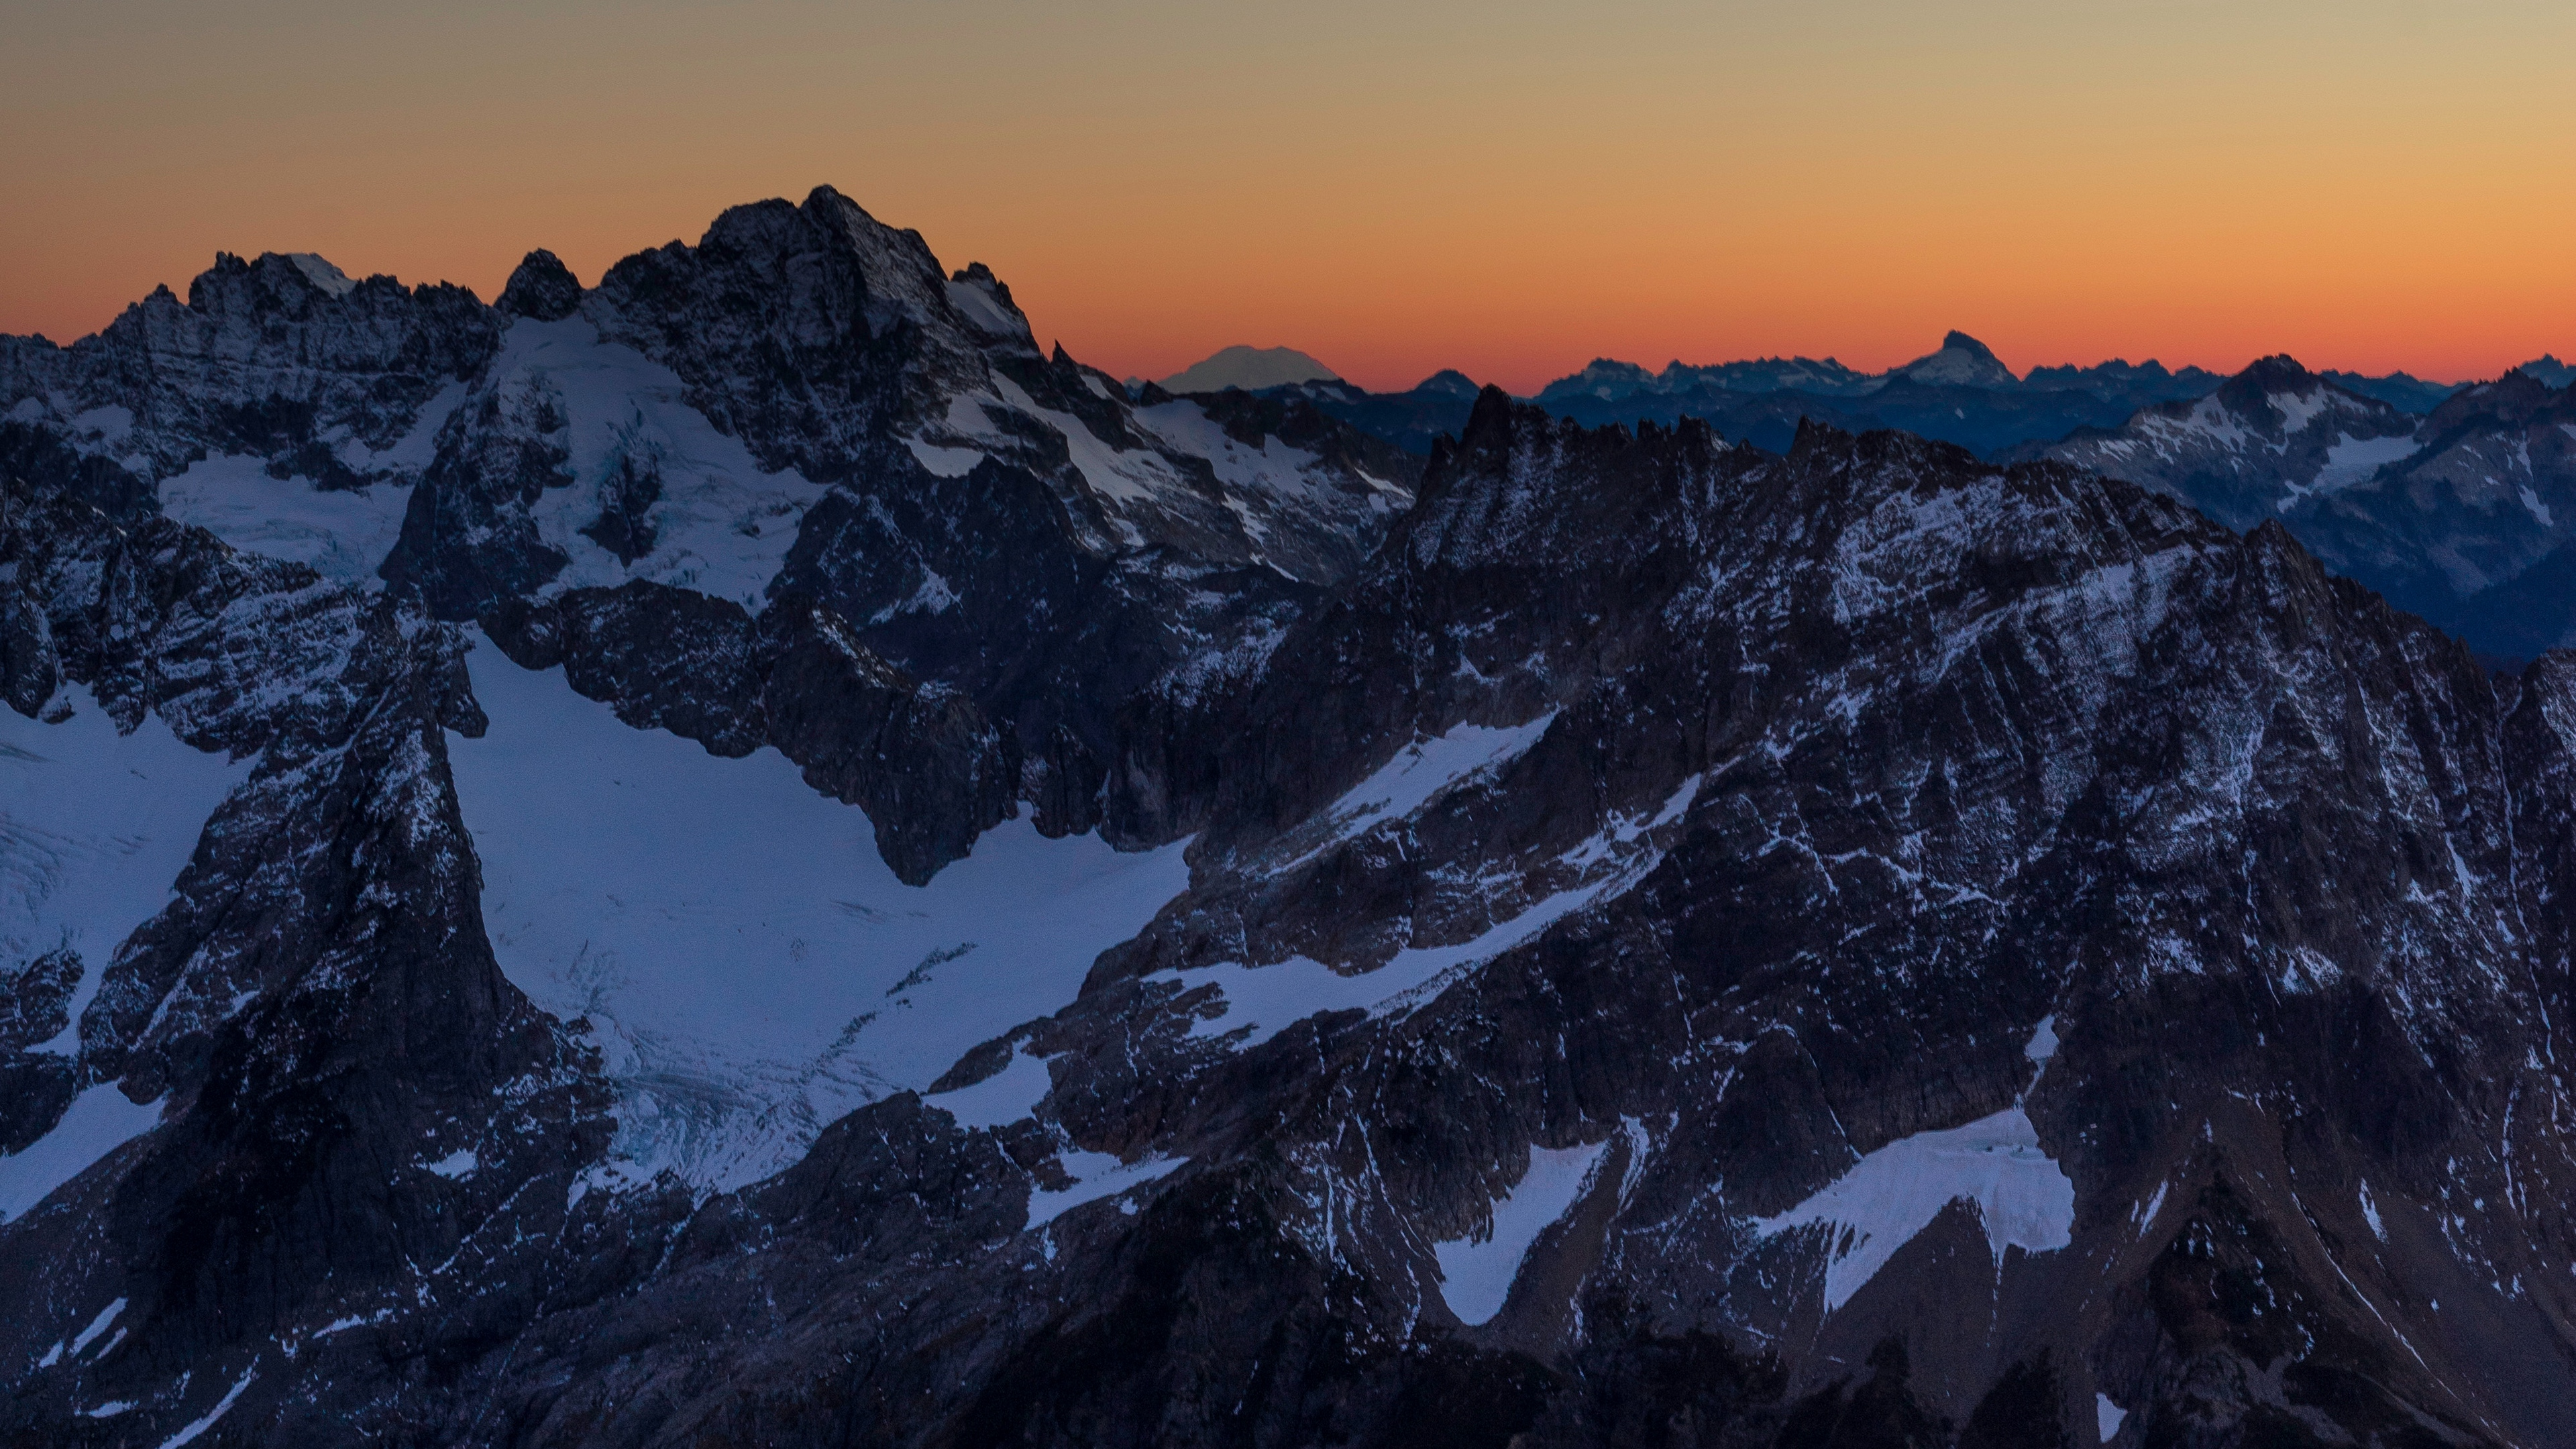 mountains peaks snowy sunset evening sky 4k 1541113735 - mountains, peaks, snowy, sunset, evening, sky 4k - Snowy, Peaks, Mountains